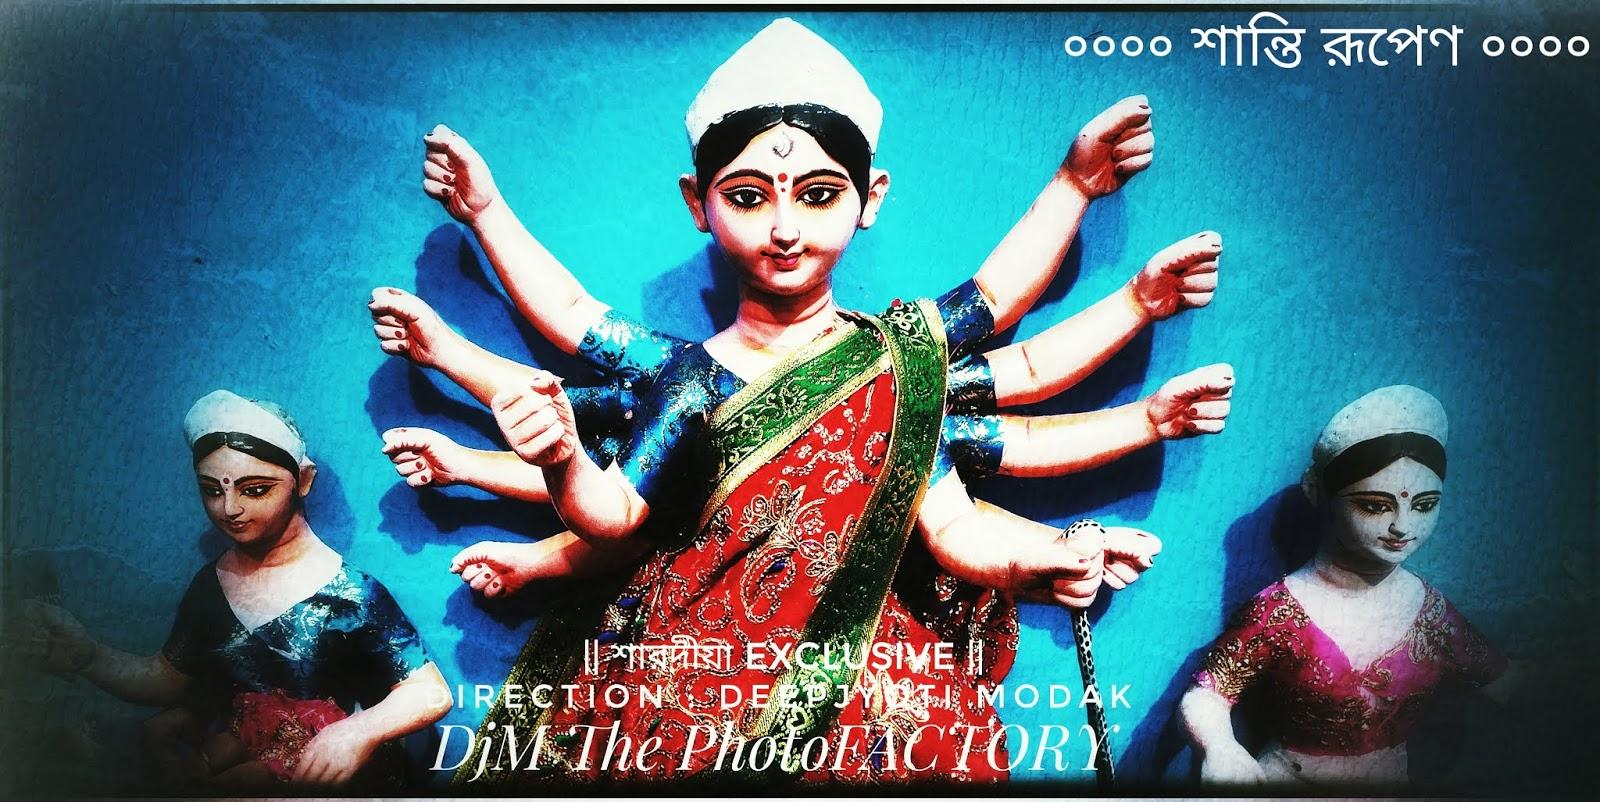 Happy Durga Puja 2019 Photoes, DjM The PhotoFACTORY